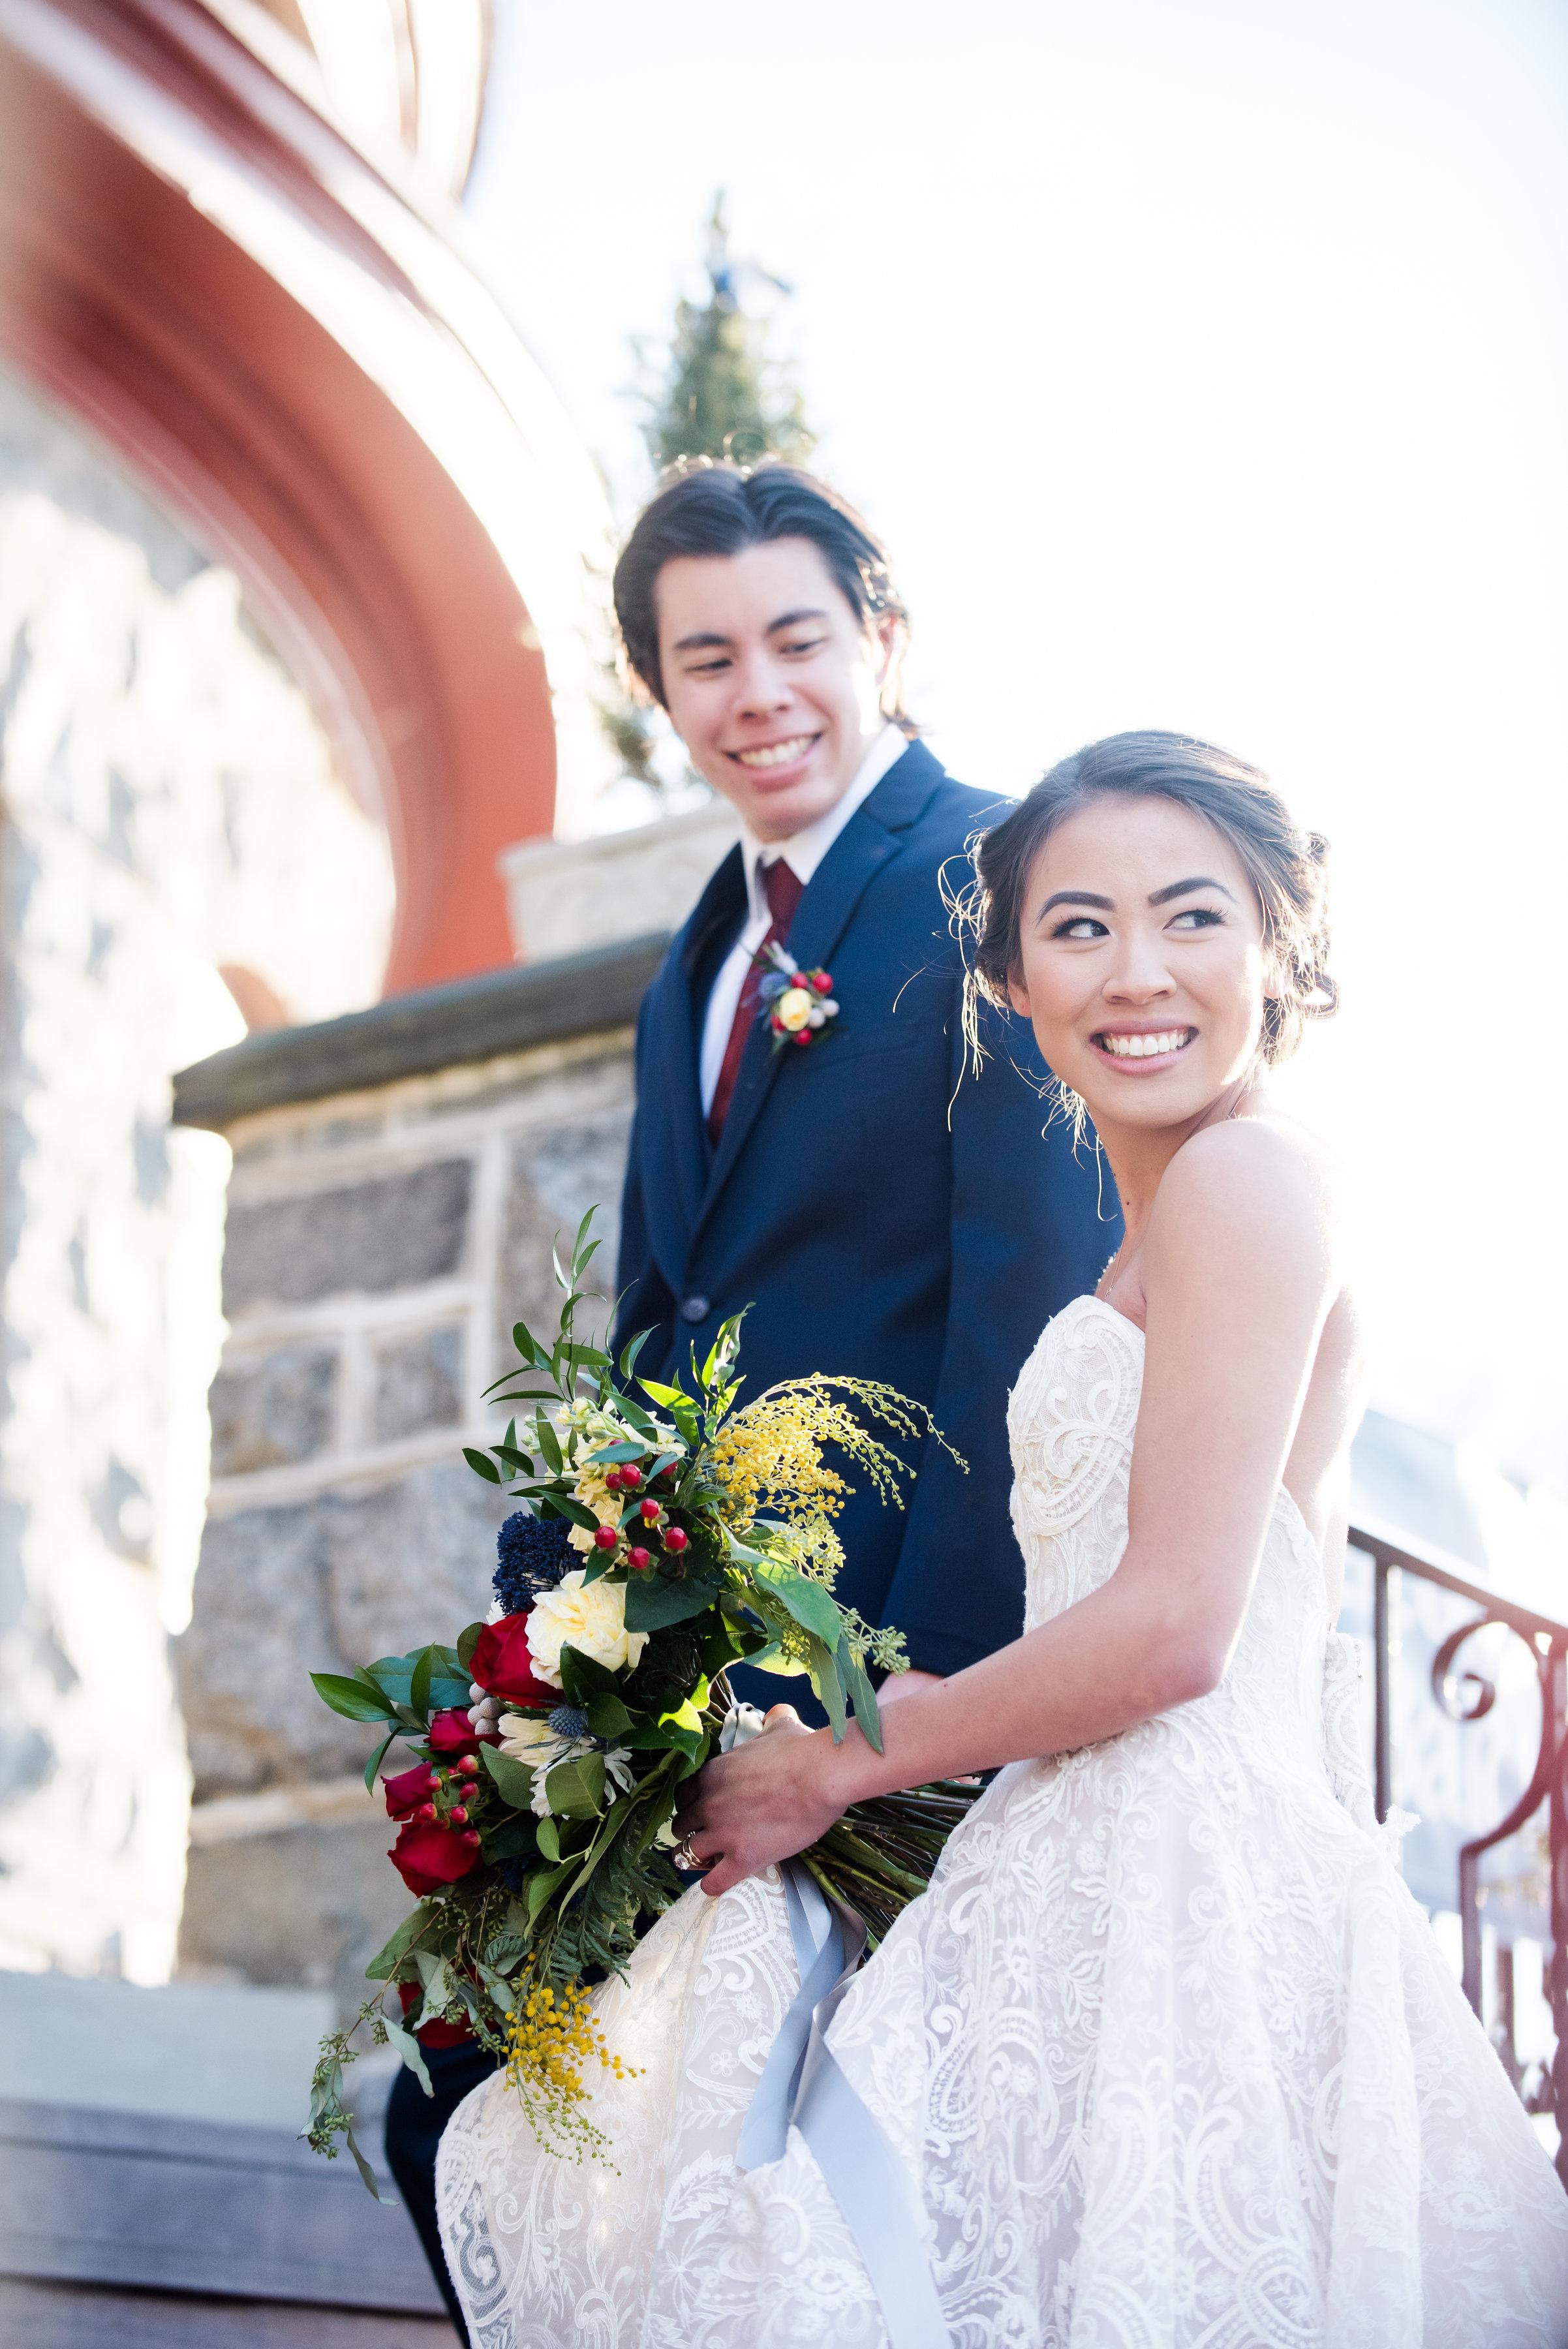 Baldwin-School-Wedding-Photographer-Event-Venue-Pennsylvania-Mainline-Andrea-Krout-Photography-536.jpg